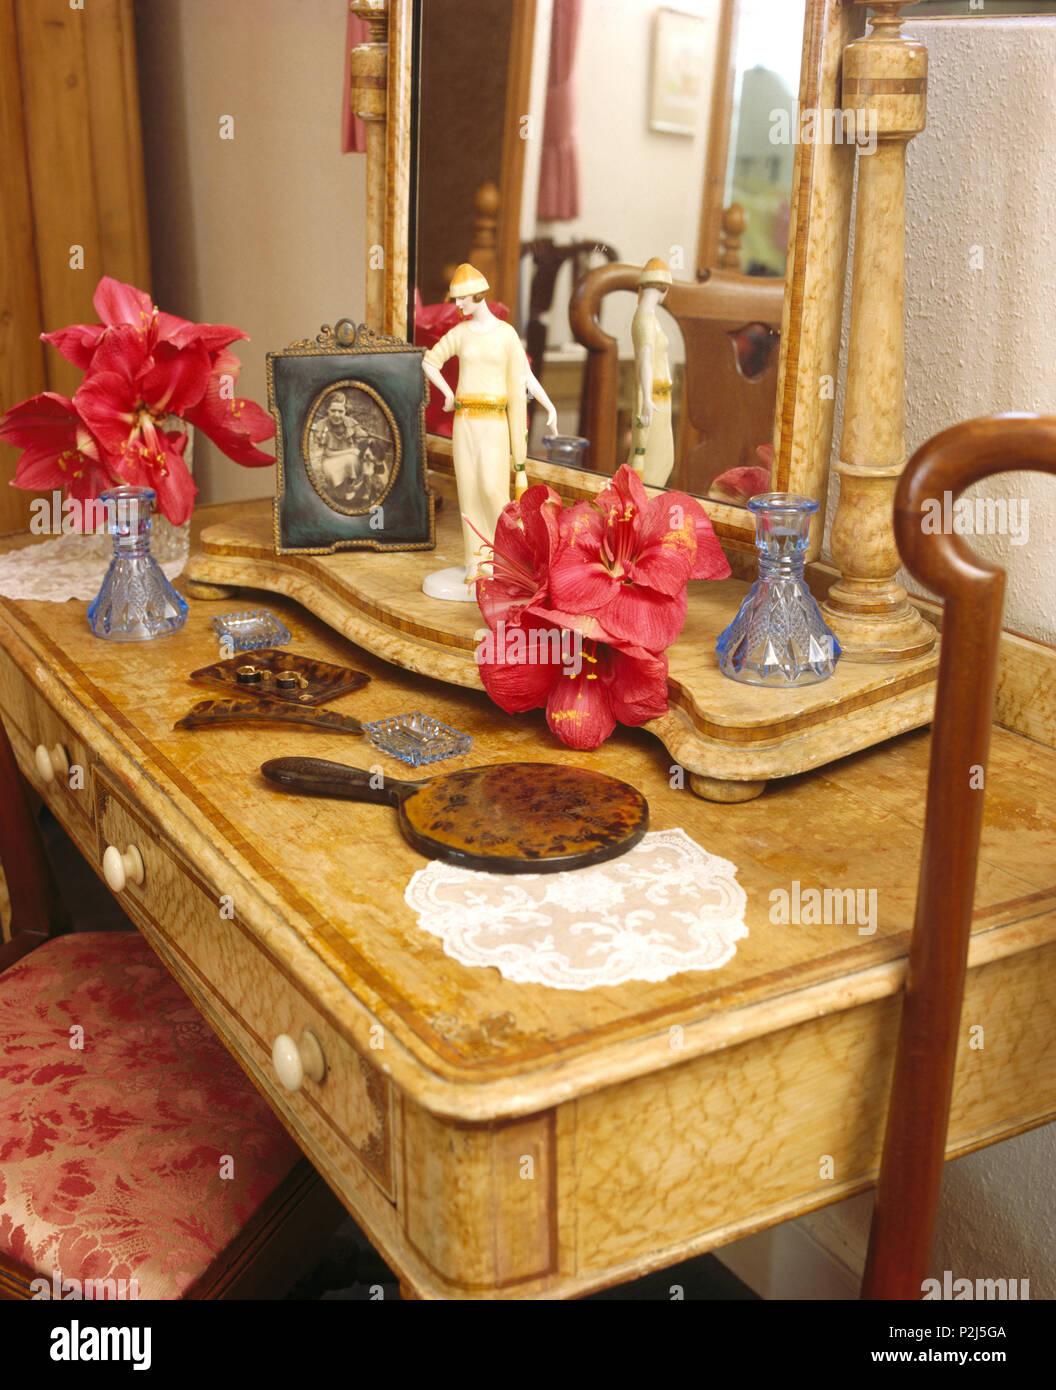 Faux amaryllis on vintage dressing table with tortoiseshell vanity set and thirties figurine - Stock Image